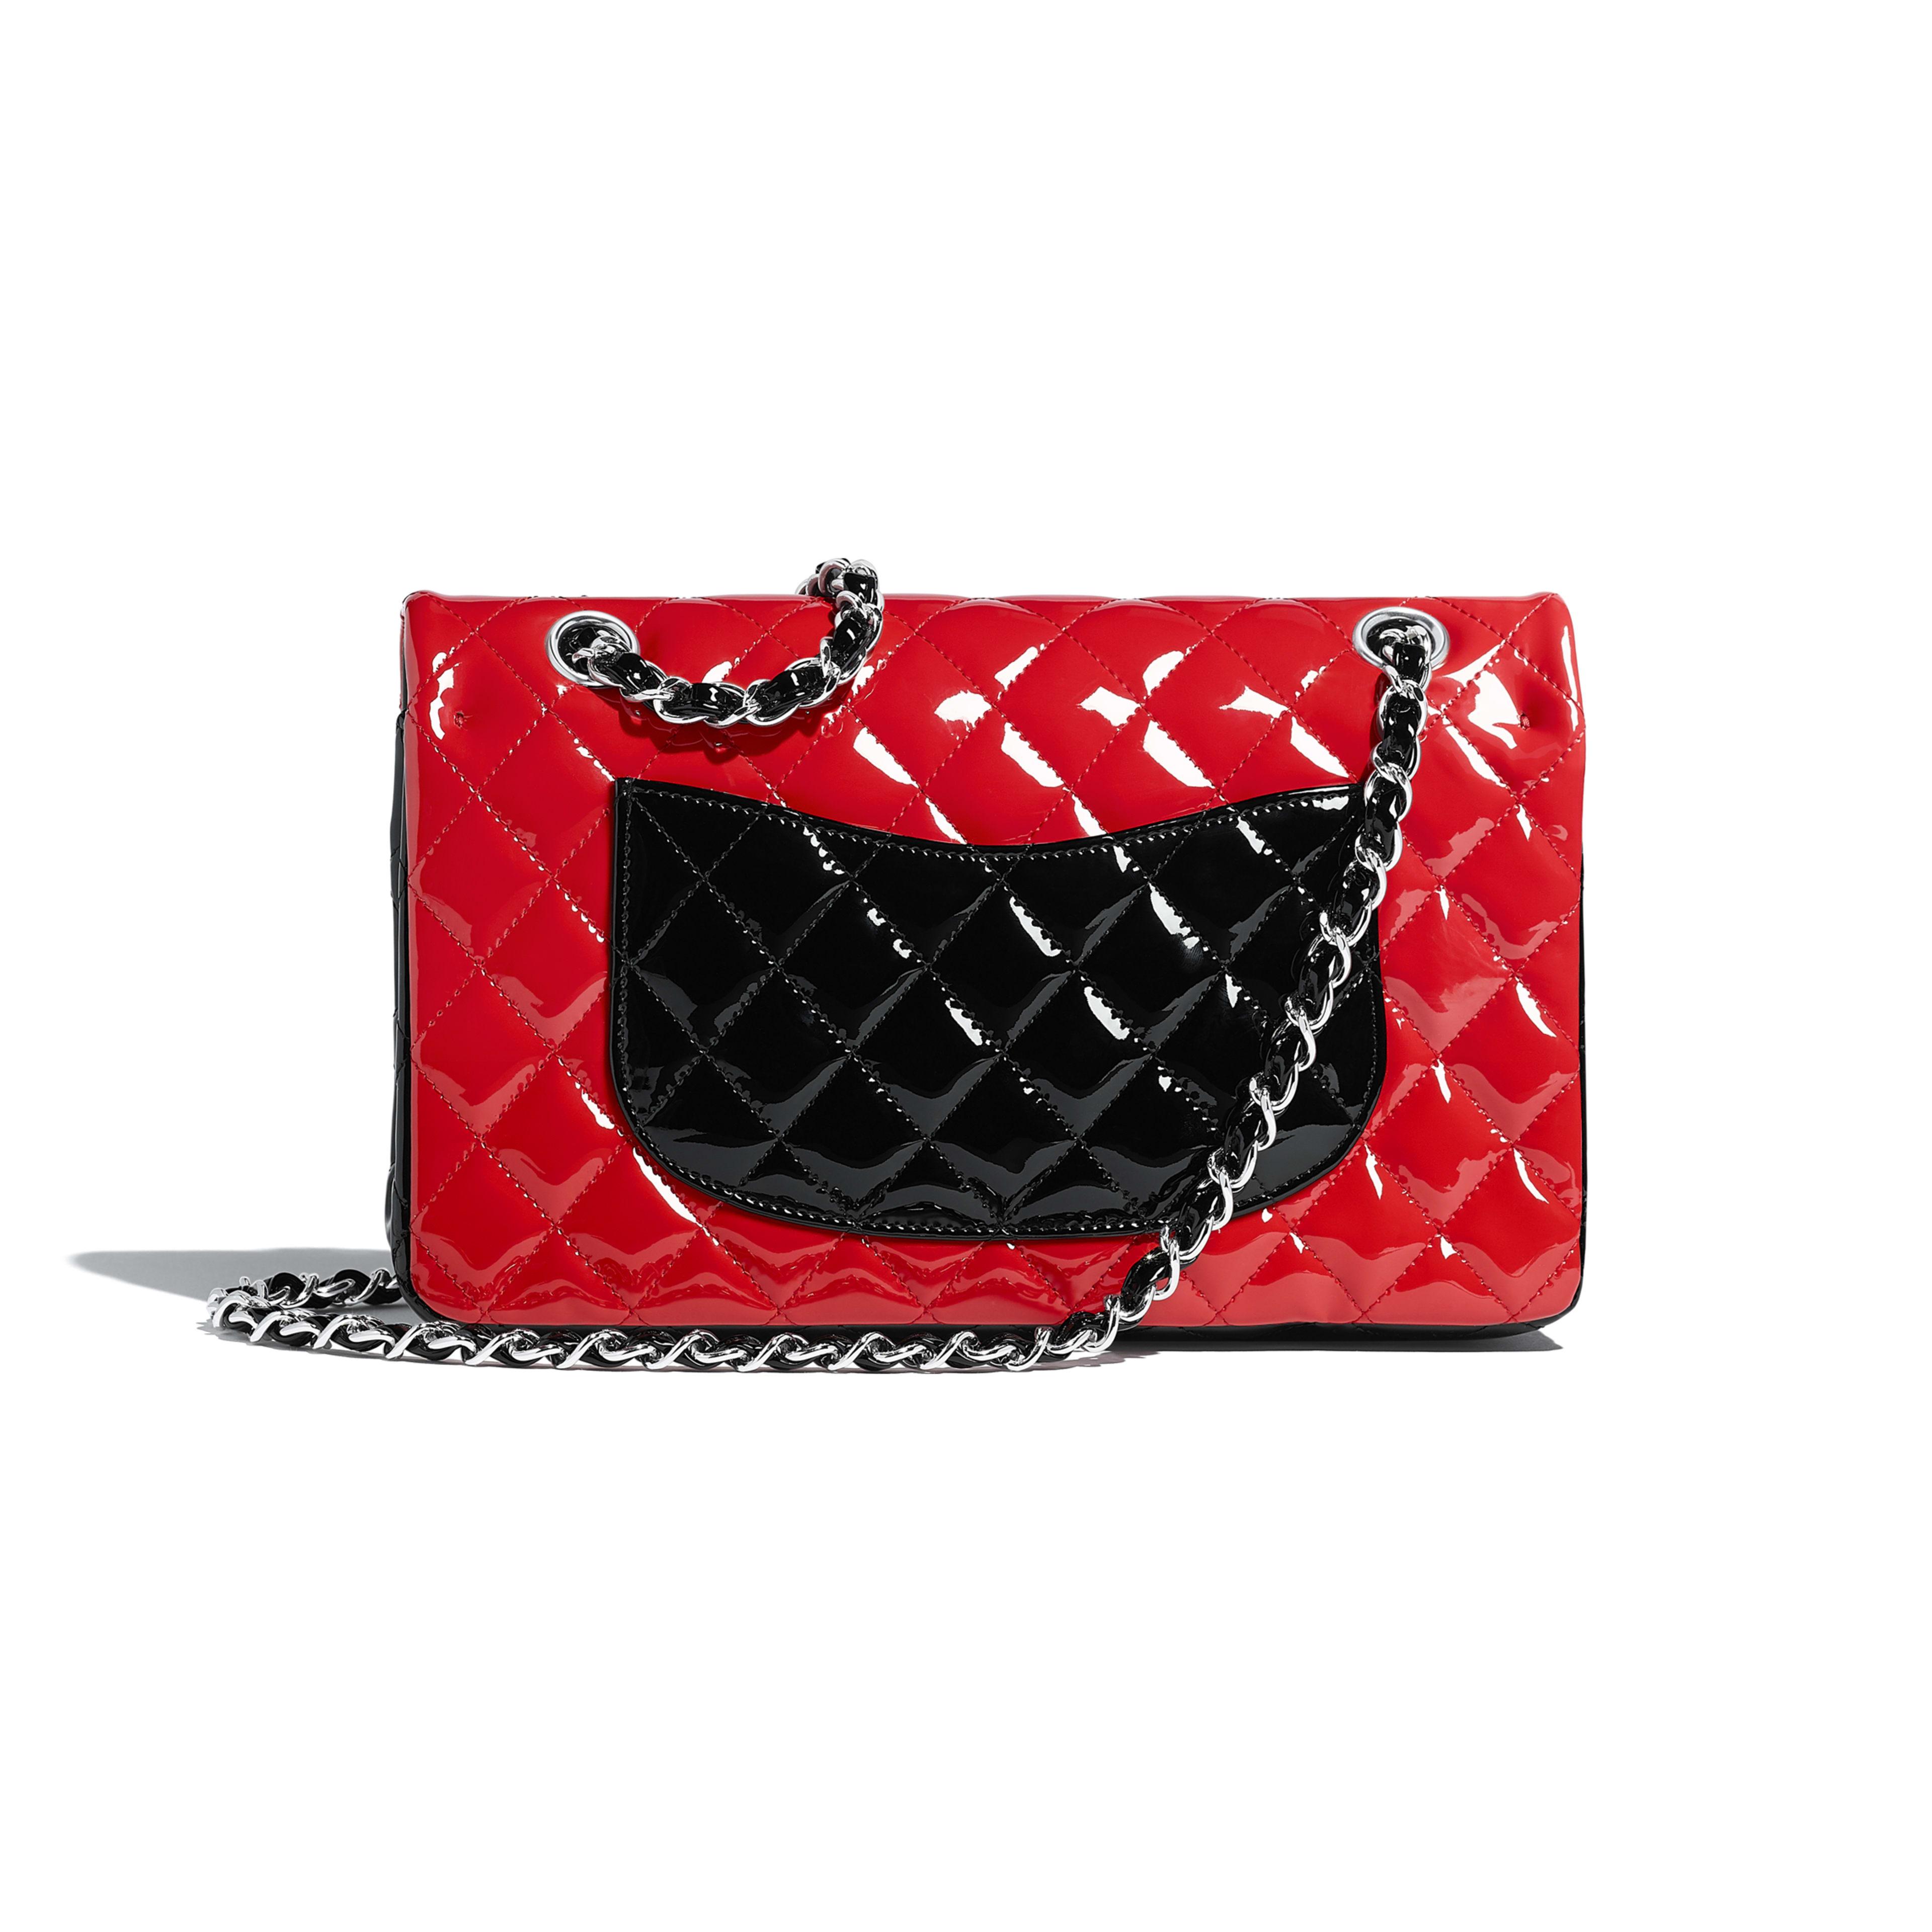 Patent Calfskin Silver Tone Metal Red Black Classic Handbag Chanel